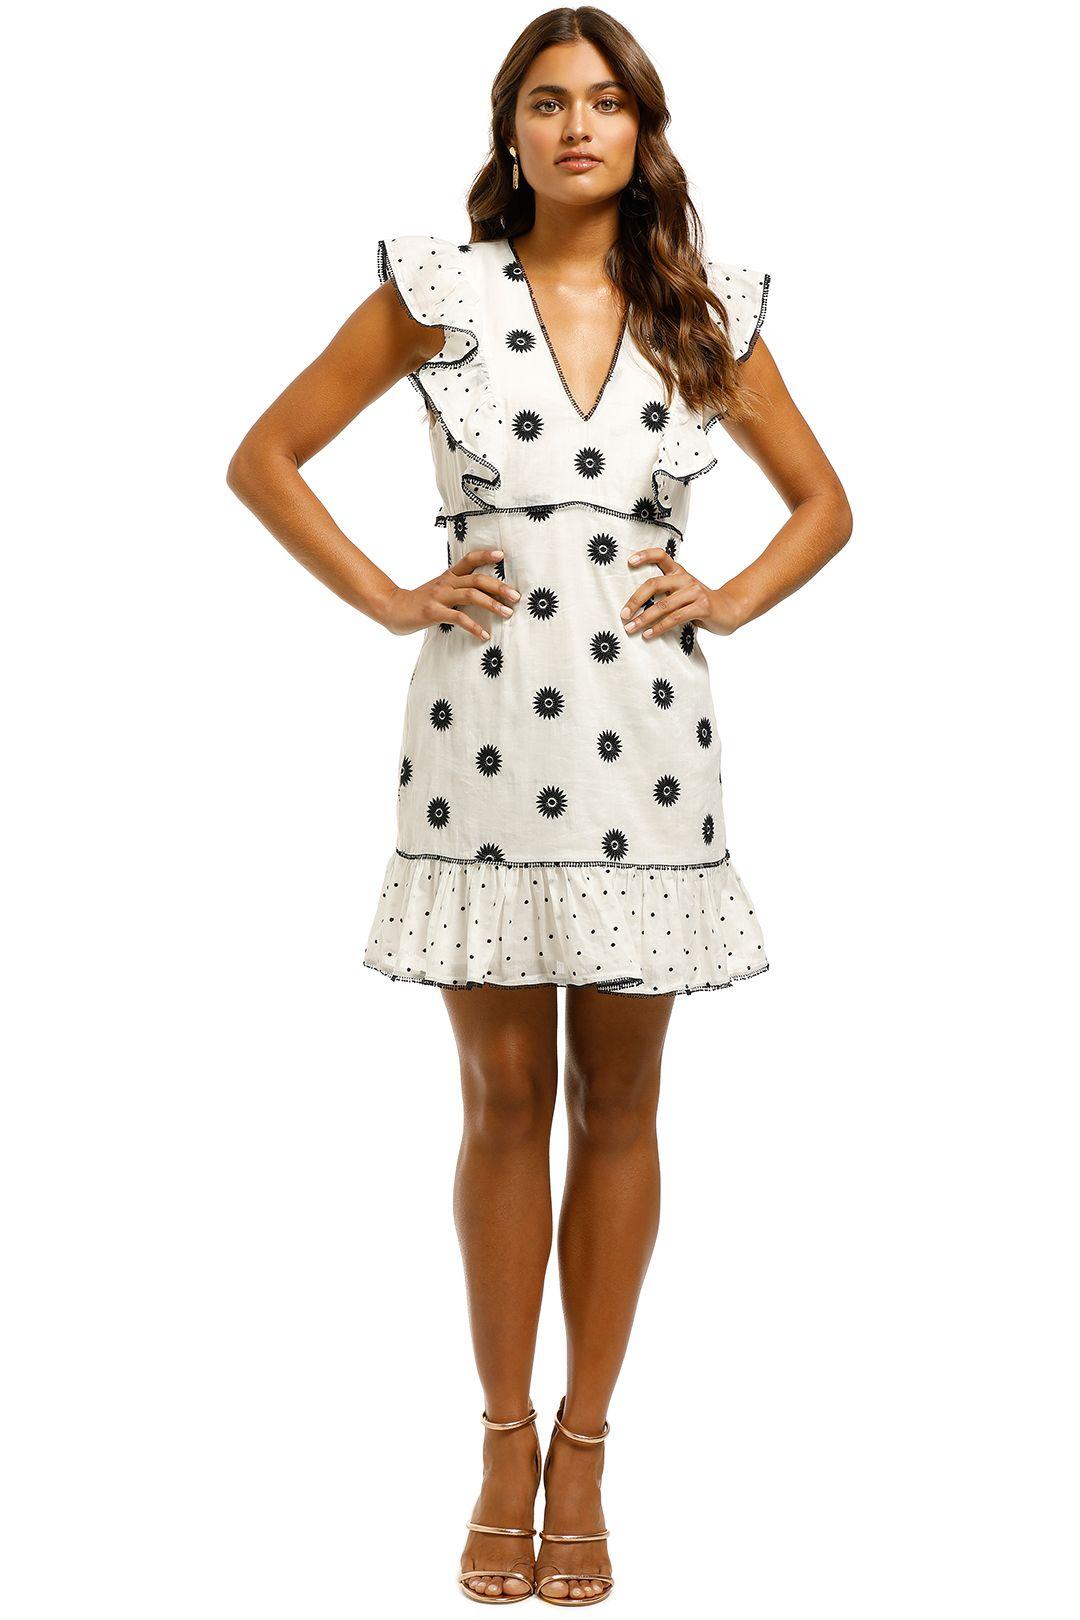 Talulah-Whimsical-Mini-Dress-Morning-Daisy-Front